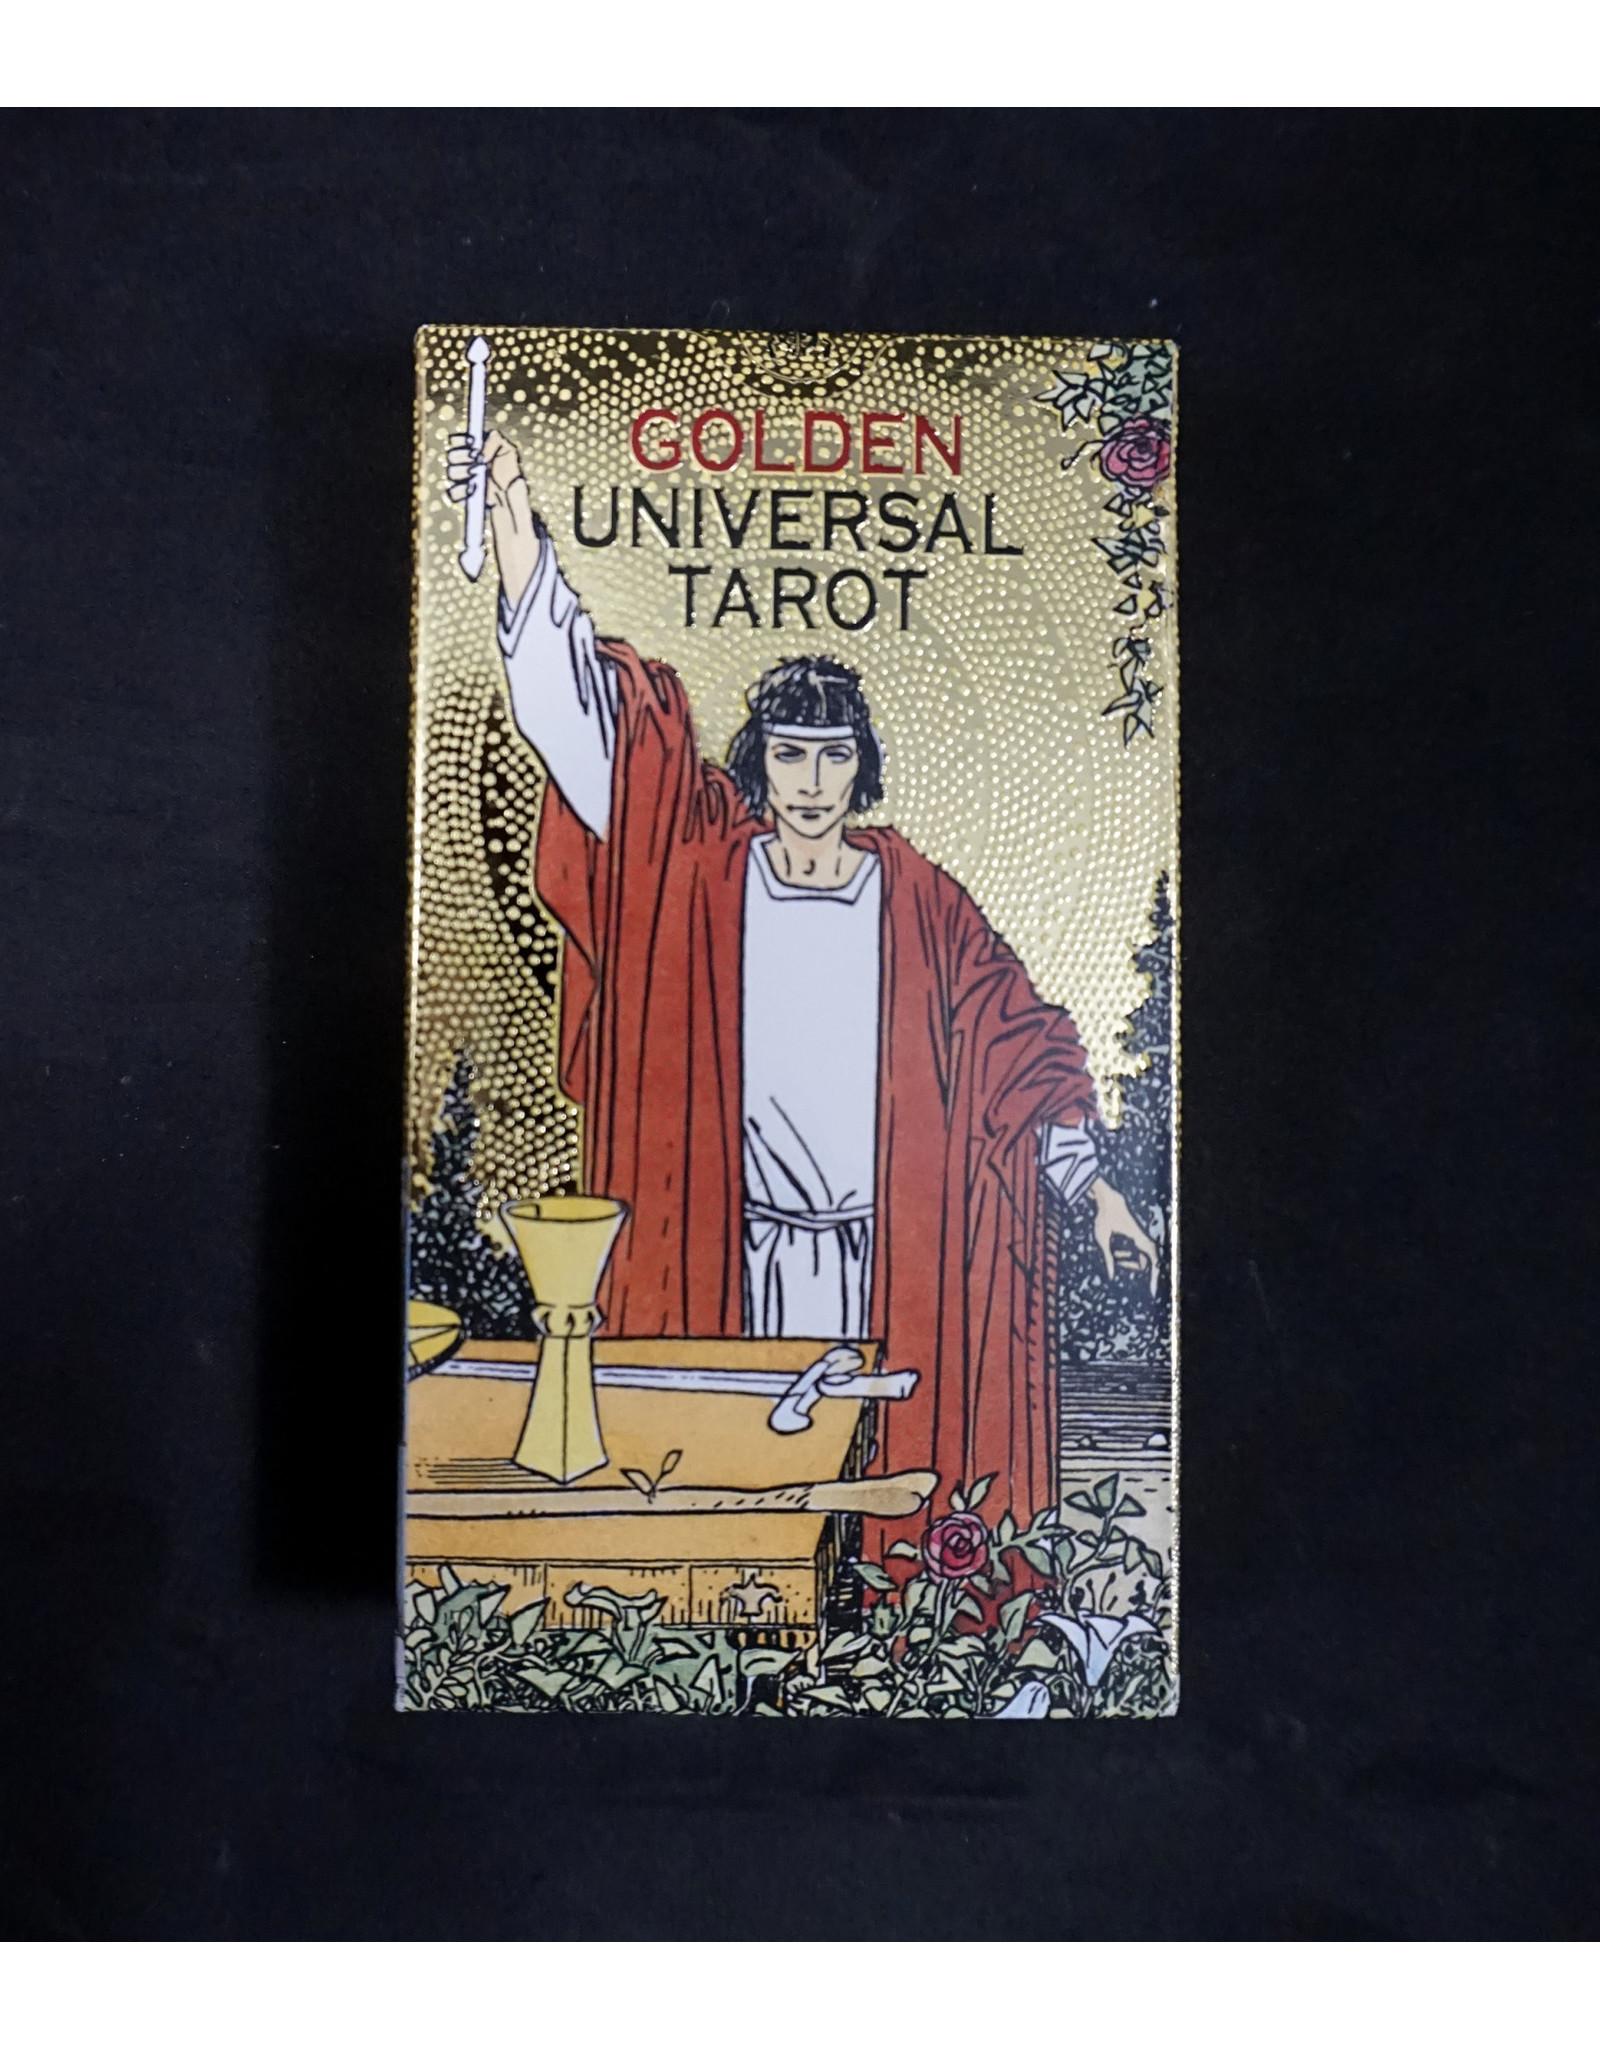 Golden Universal Tarot Deck by Lo Scarabeo